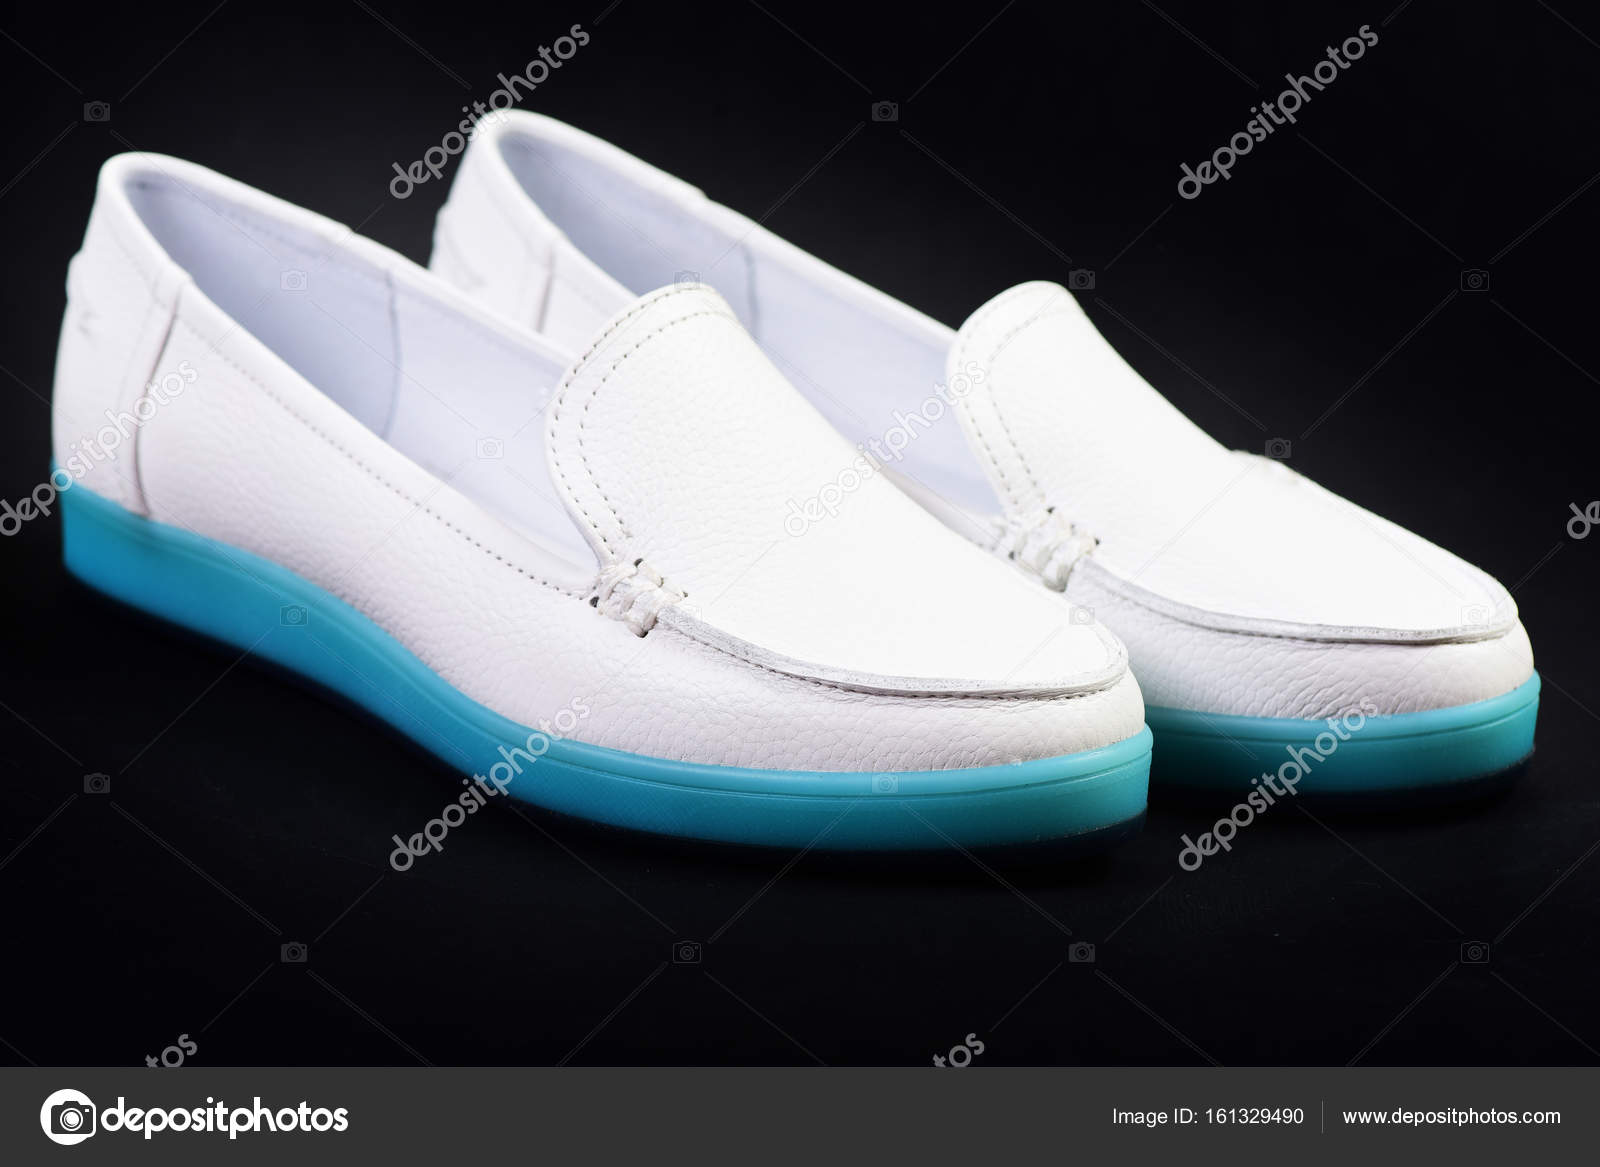 9c8a072536d Γυναικεία Μοκασίνια σε λευκό χρώμα. Ζευγάρι γυναικεία δερμάτινα ...